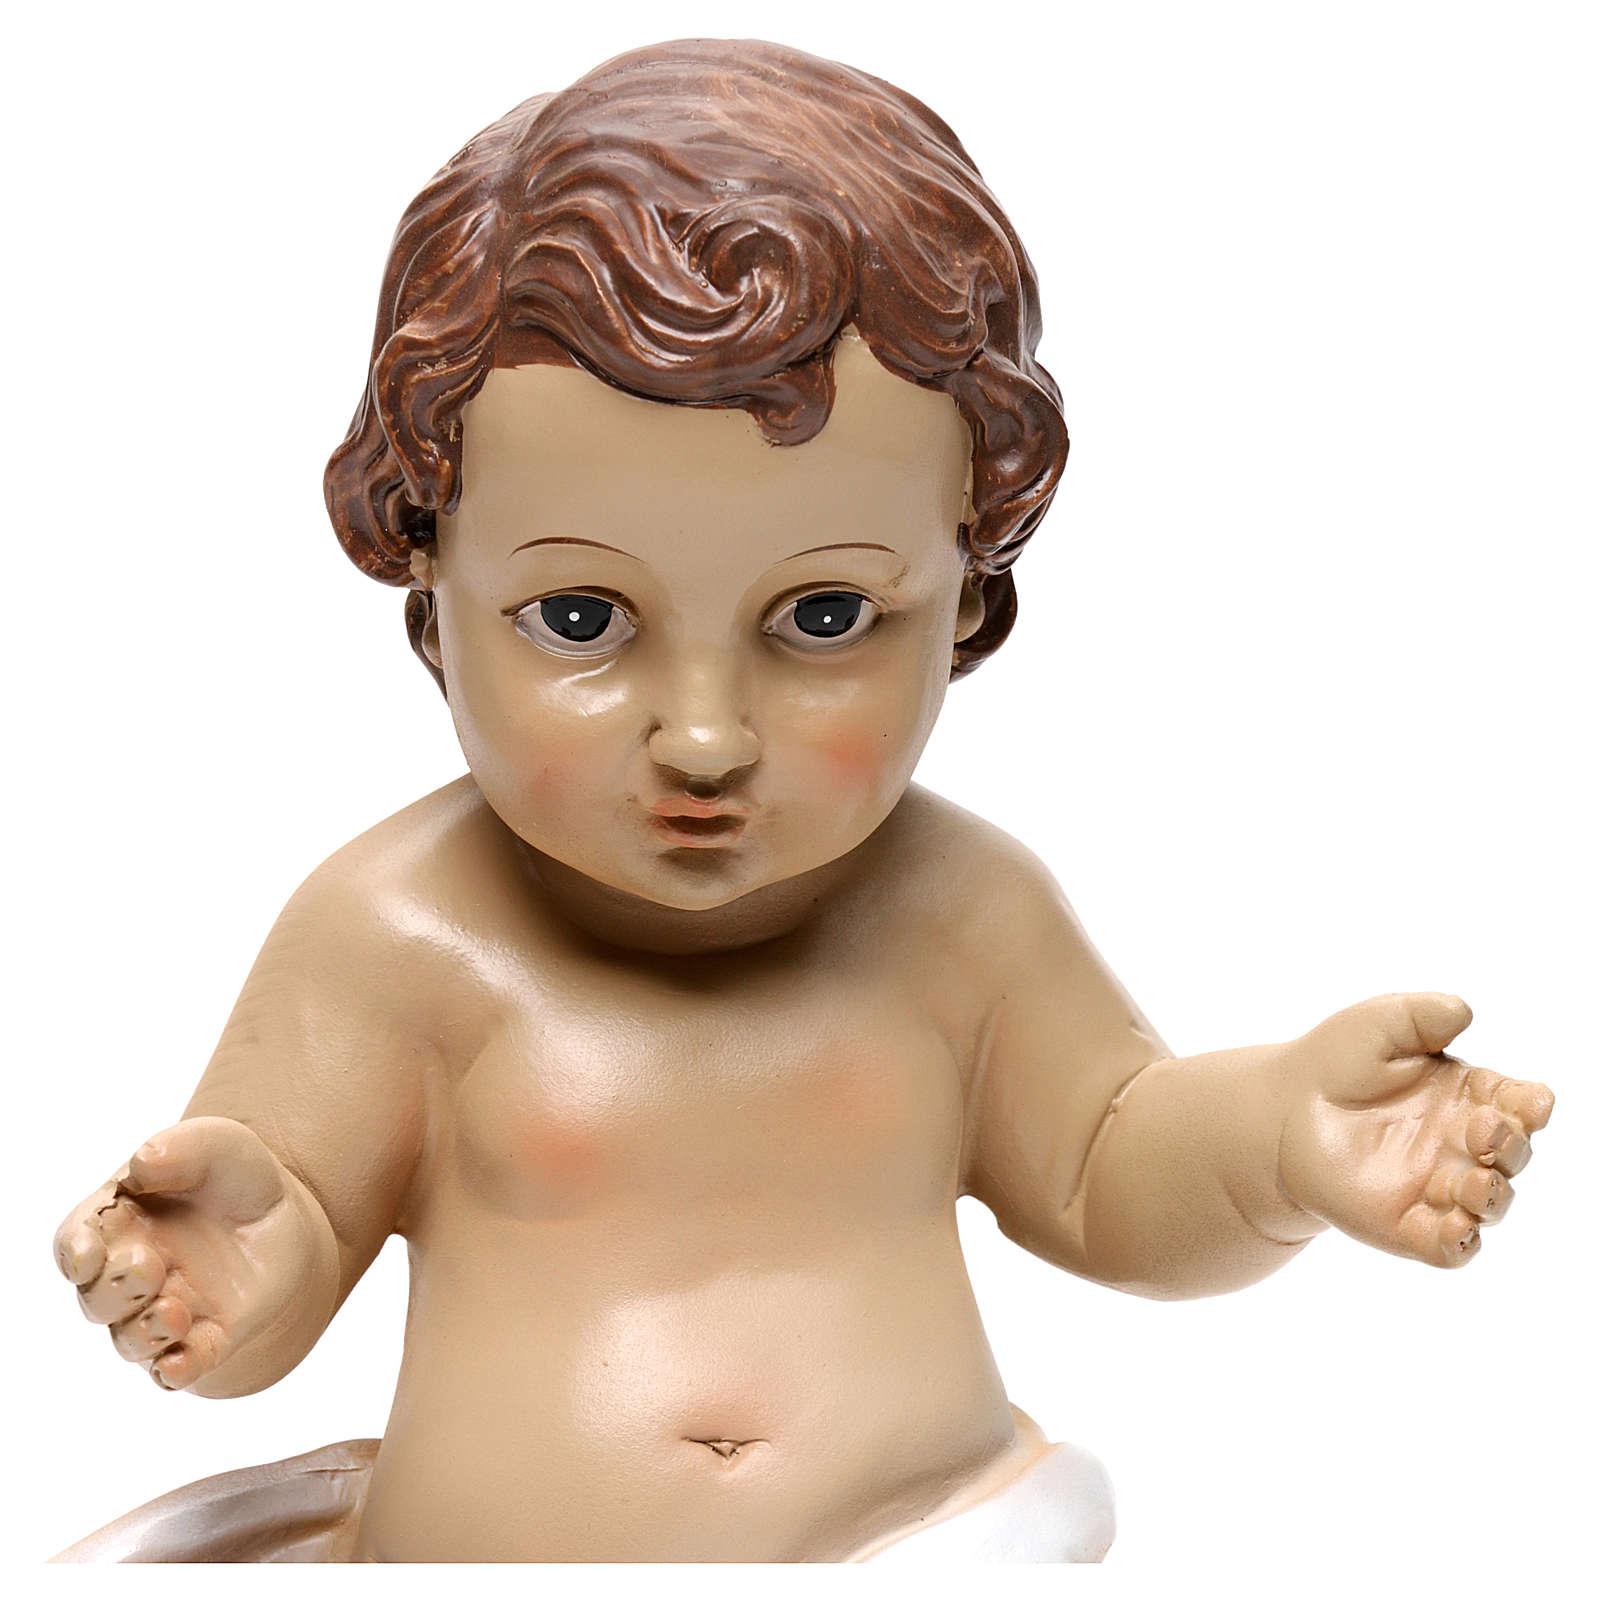 Baby Jesus statue in resin 26 cm 3